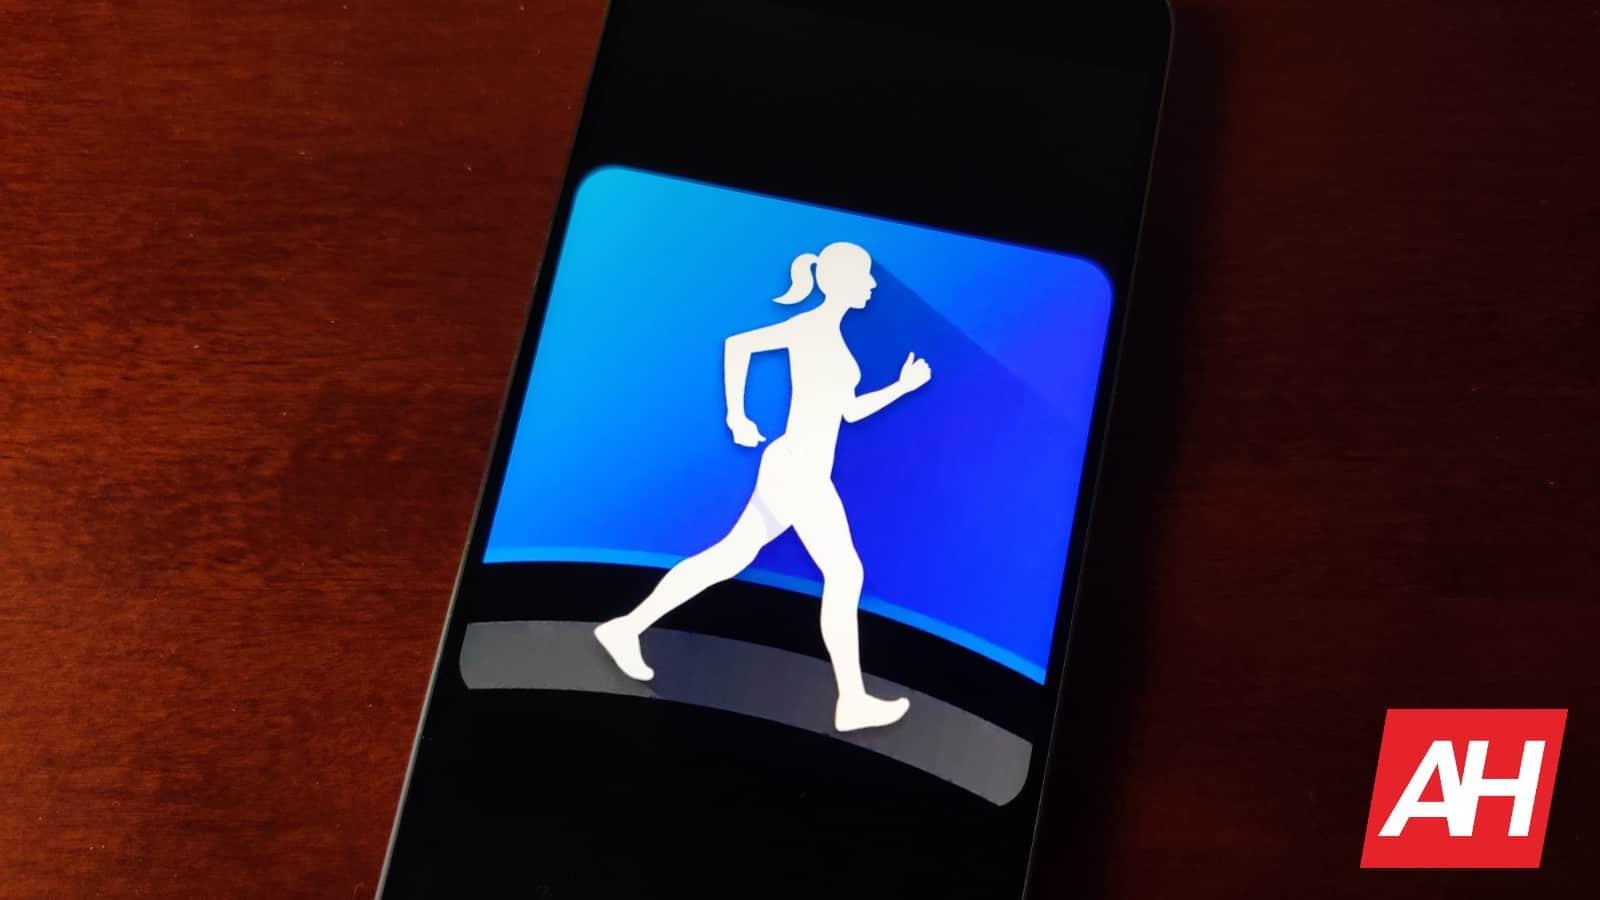 AH best walking apps Android June 2019